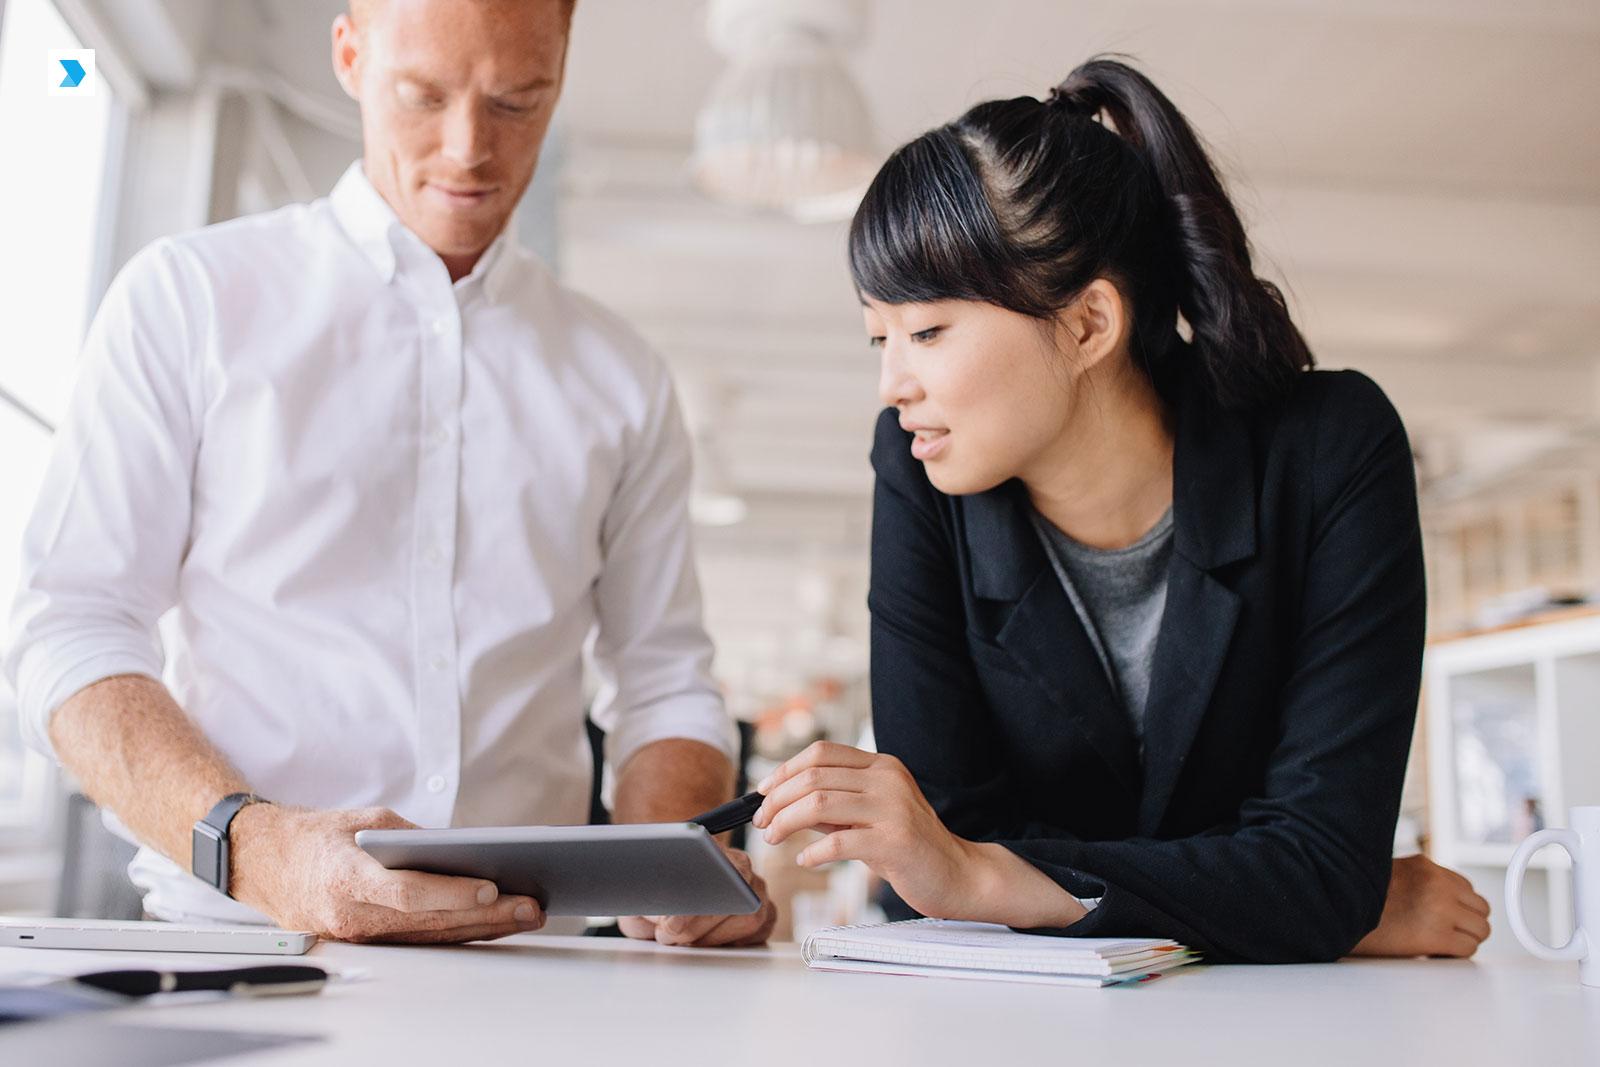 Achieve Your Digital Marketing Career Goals this 2018